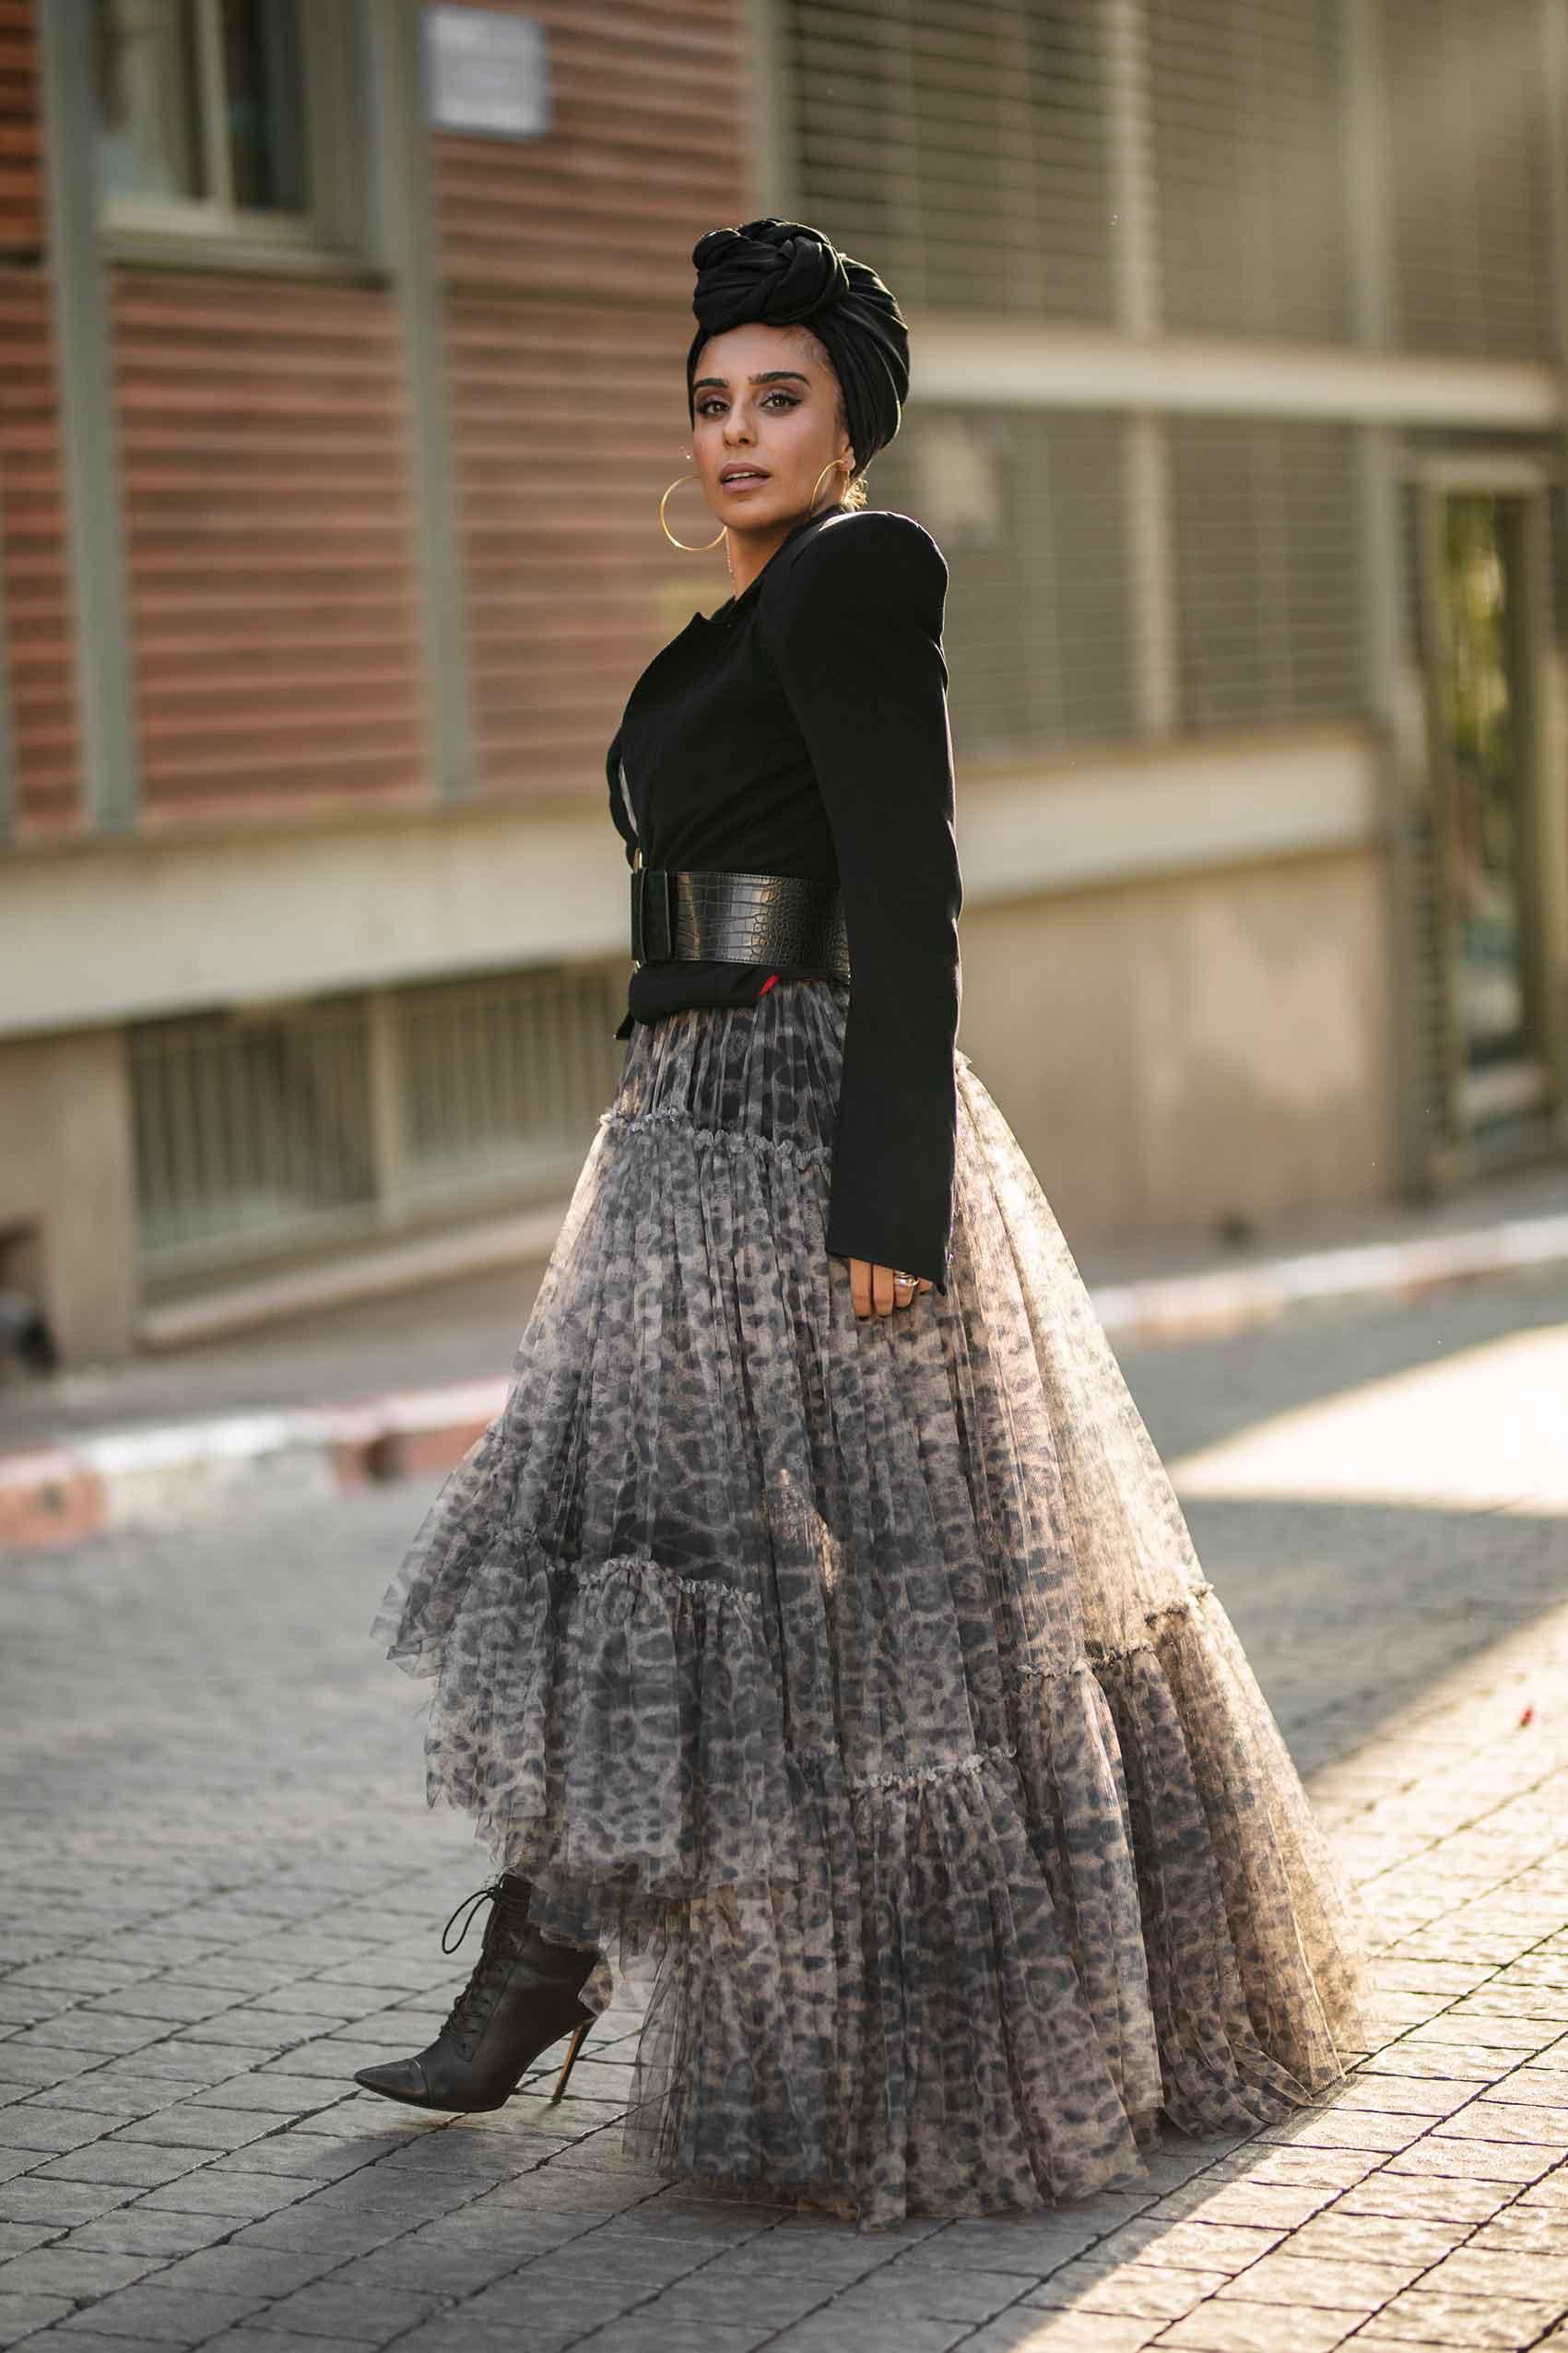 נרקיס-מגזין-אופנה-דיגטלי